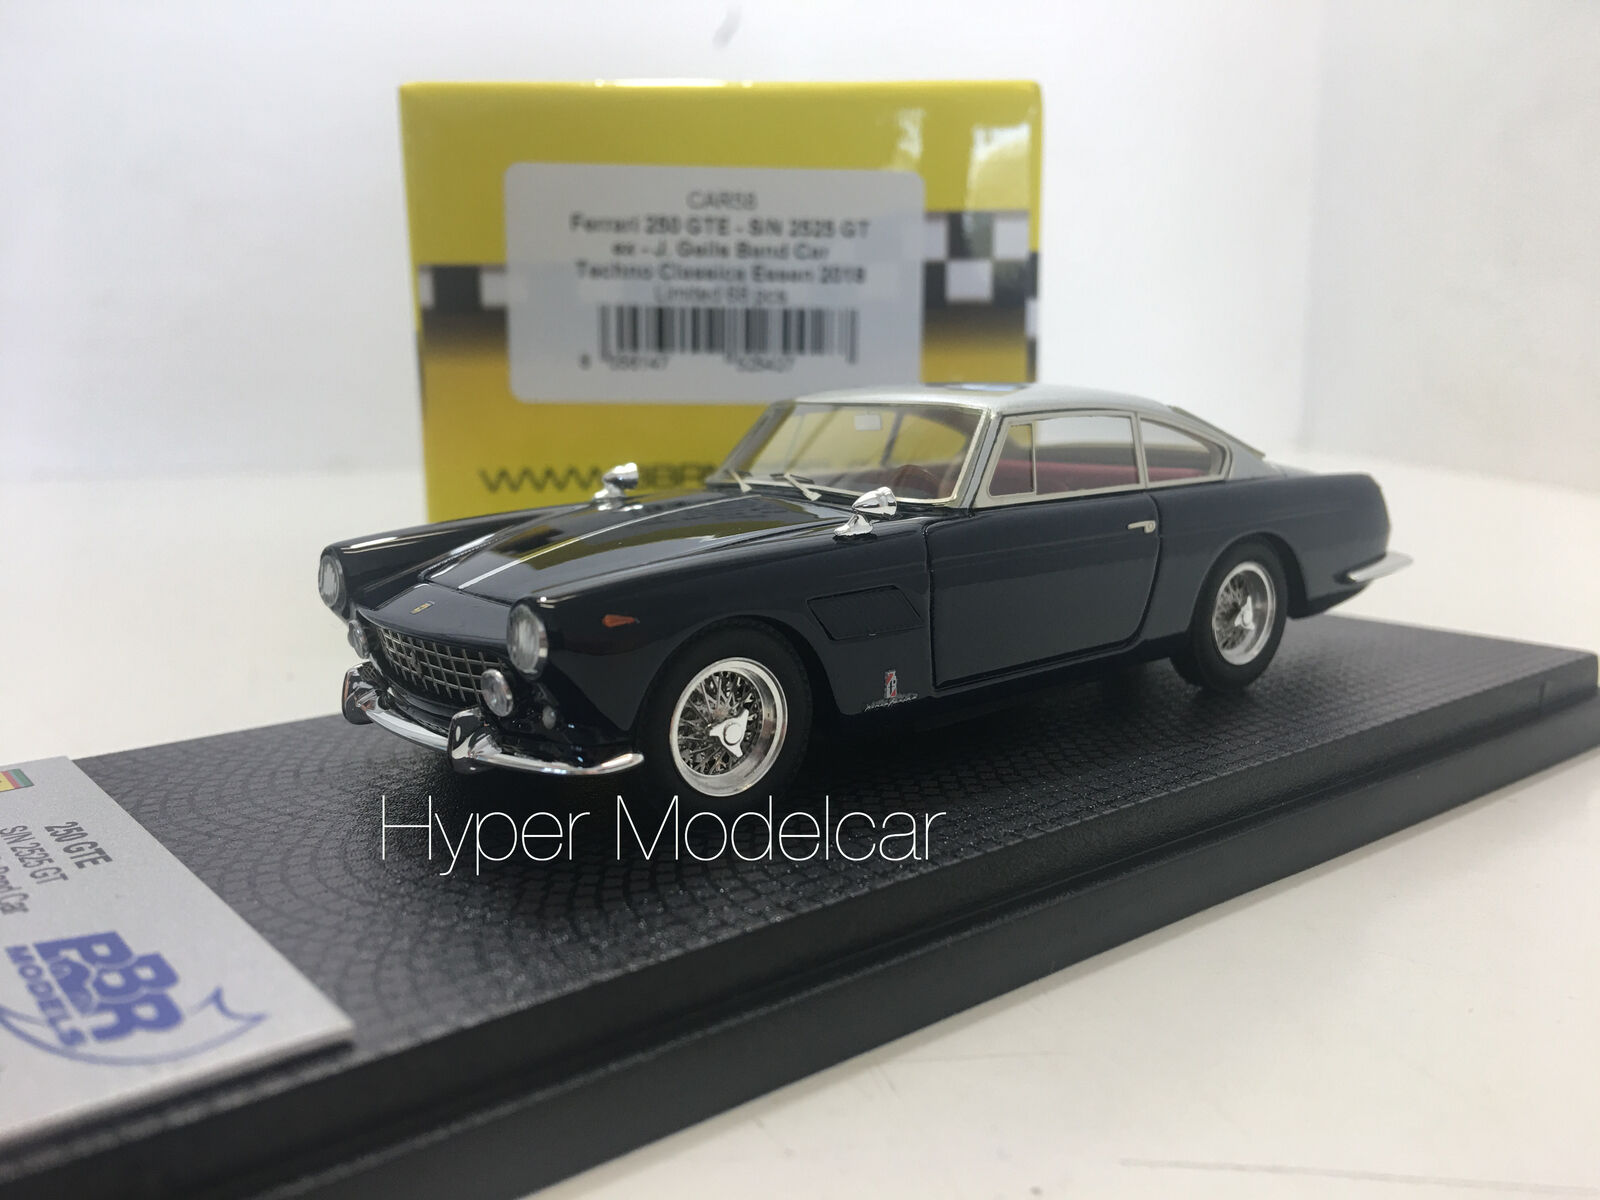 BBR 1 43 FERRARI 250 GTE S N 2525GT COUPE 1959 TECHNO CLASSICA ART. CAR58